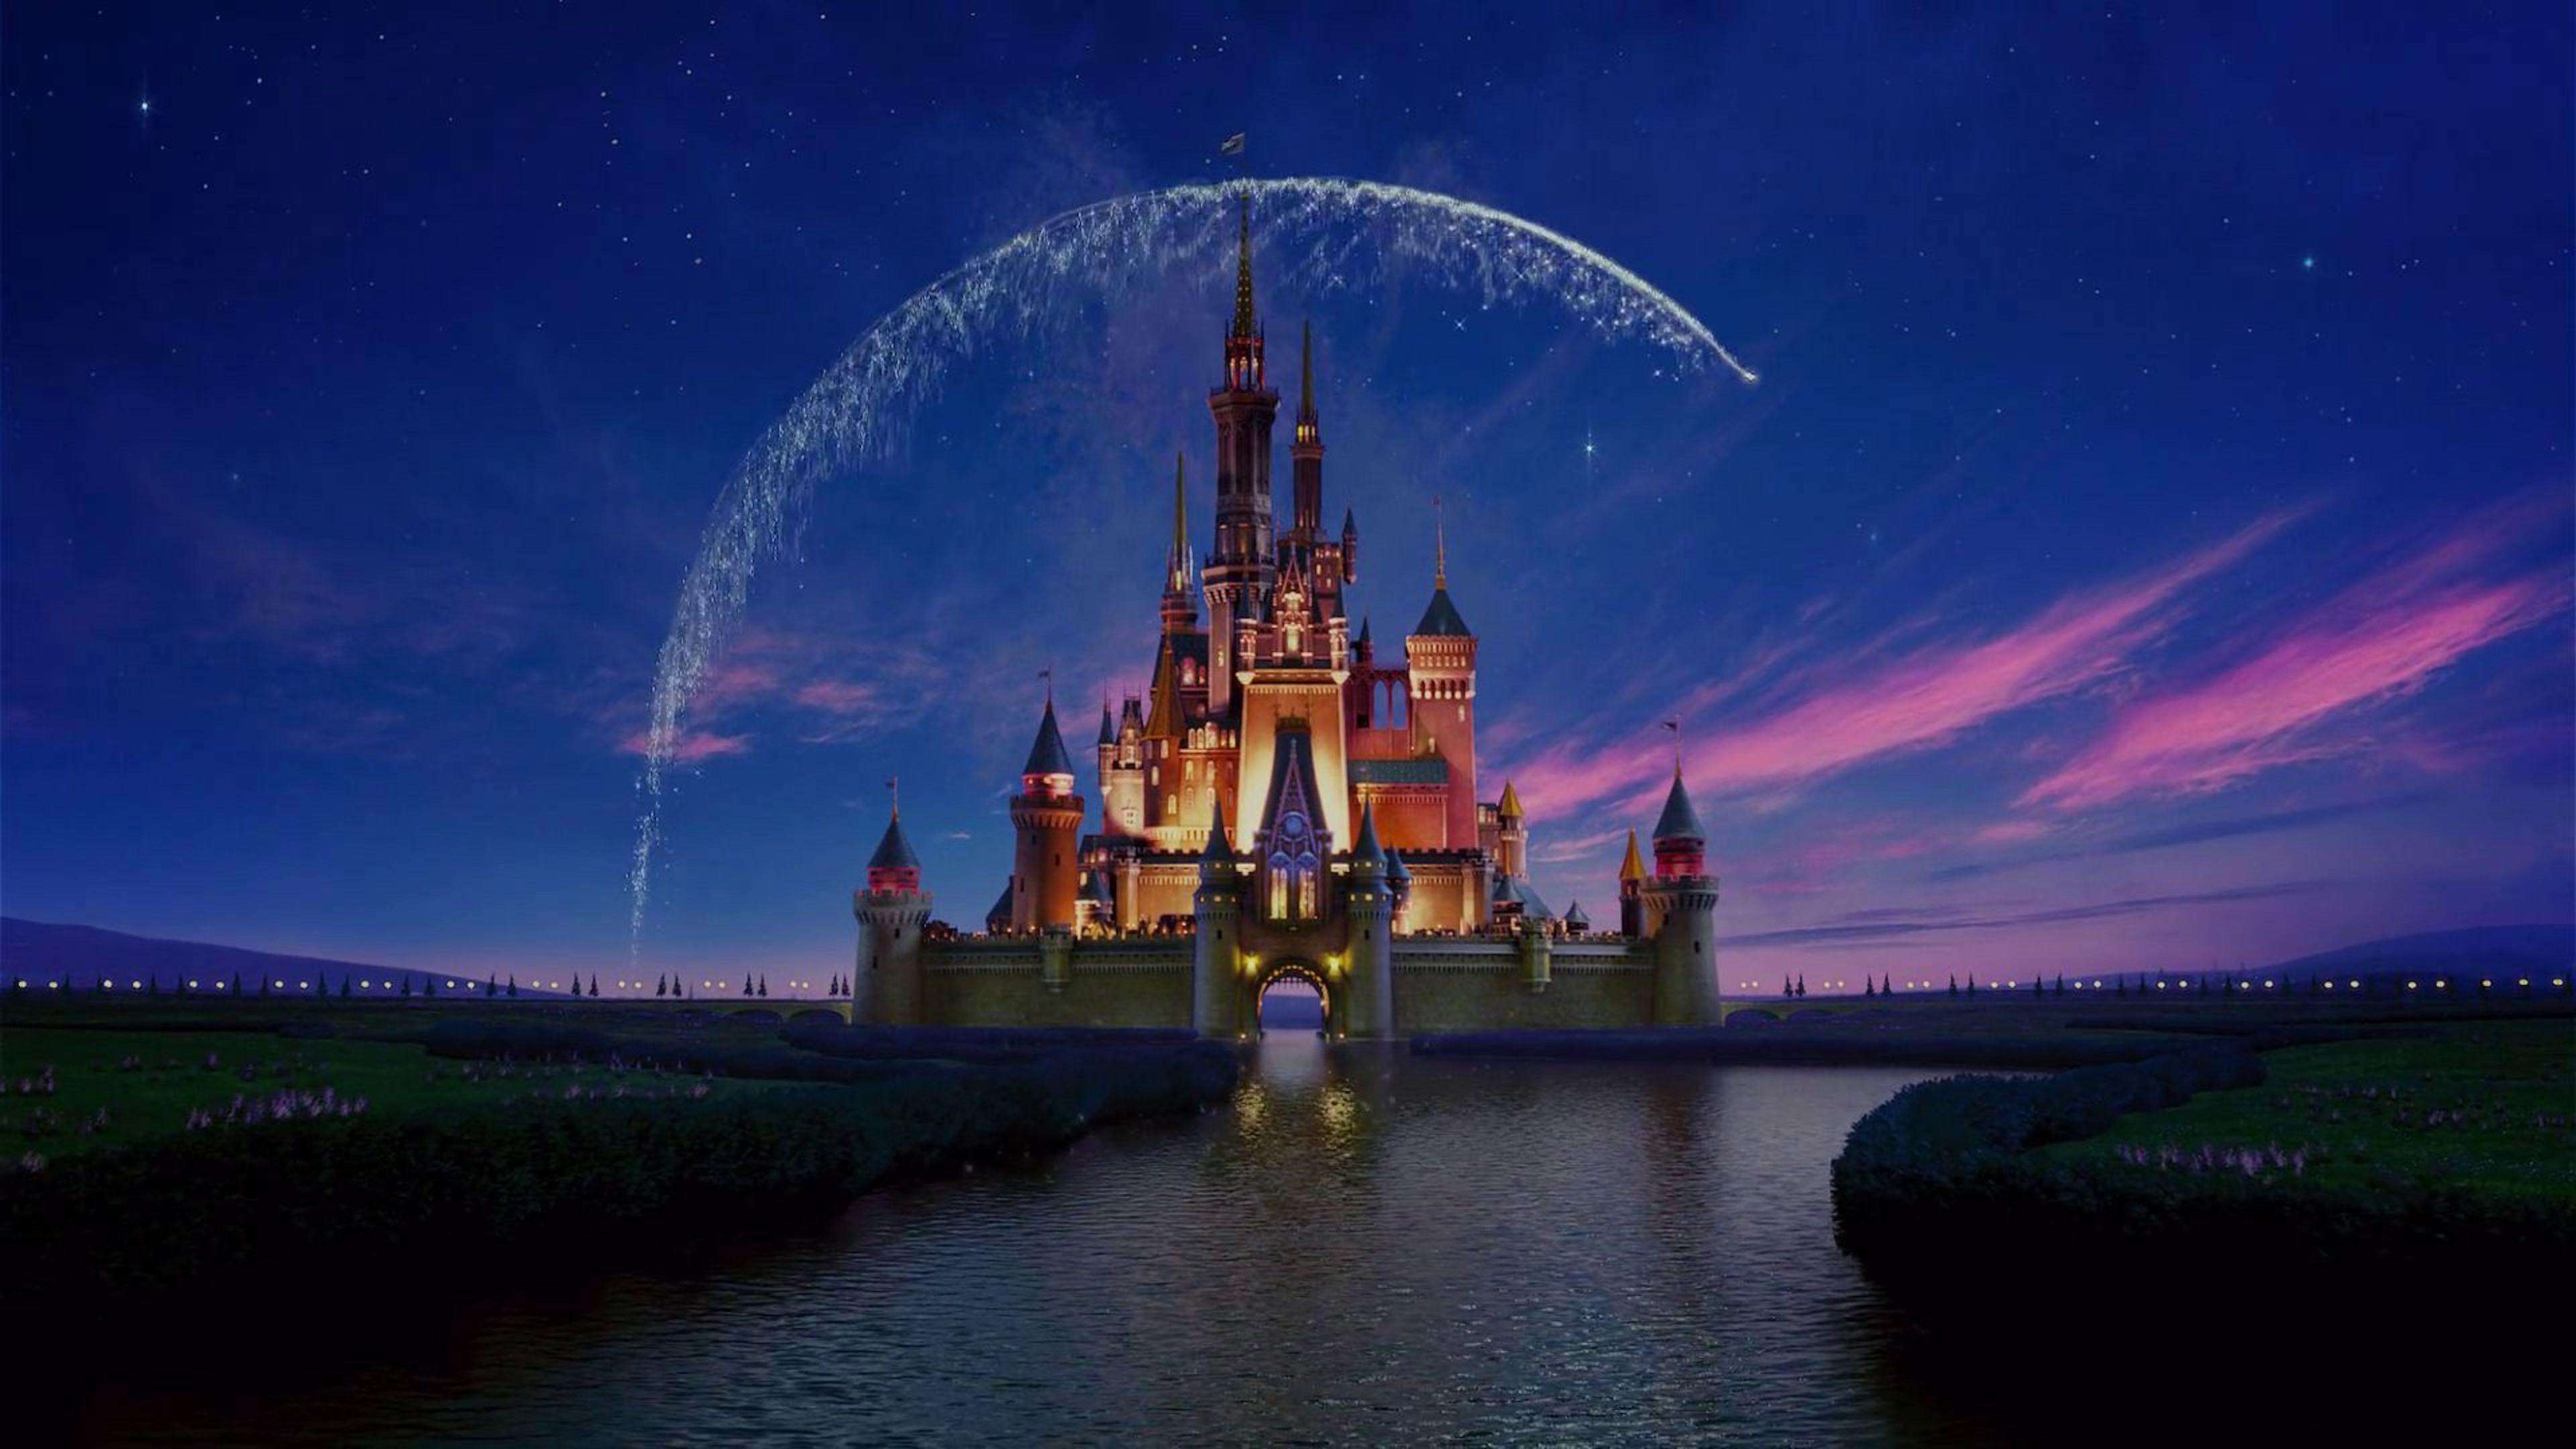 3840x2160 3840x2160 Photos Disney Wallpapers Hd Disney Background Disney Desktop Wallpaper Cute Disney Wallpaper